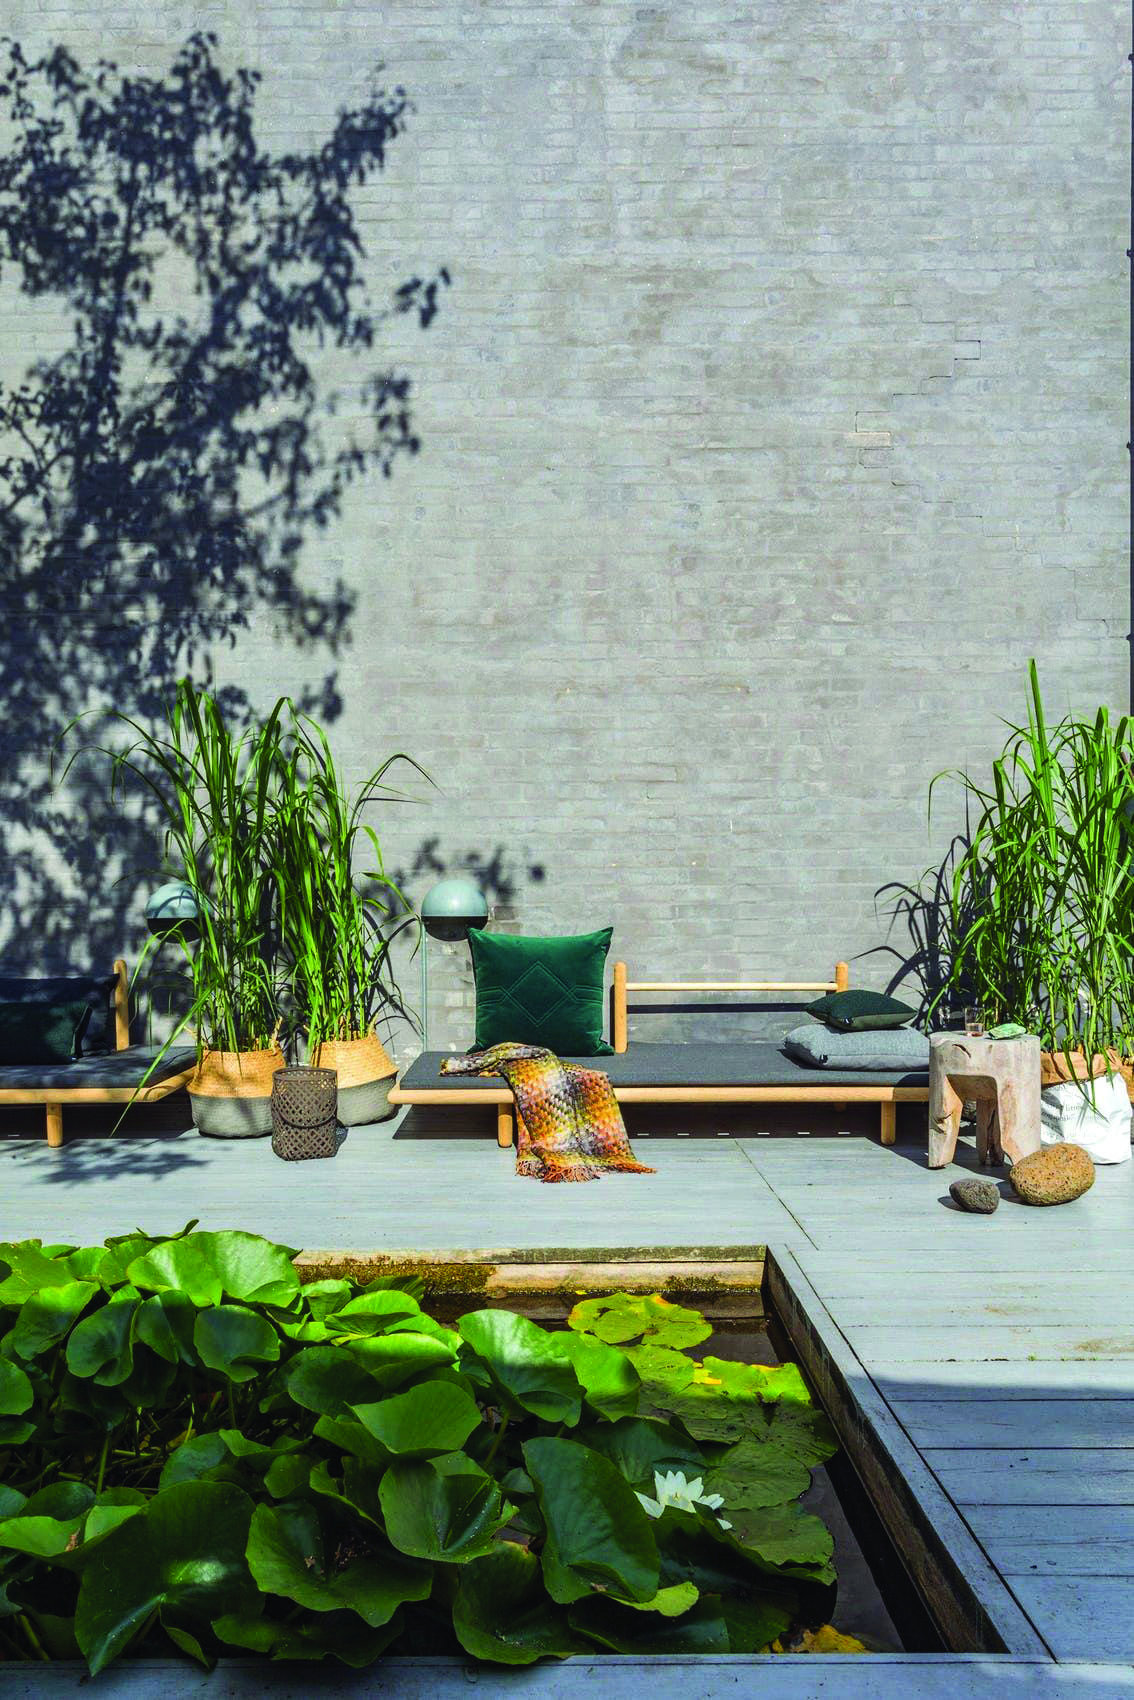 Stylish Ways To Decorate Balcony Garden Ideas Amazon Just On Shopyhomes Com Terraza Jardin Jardines Macetas